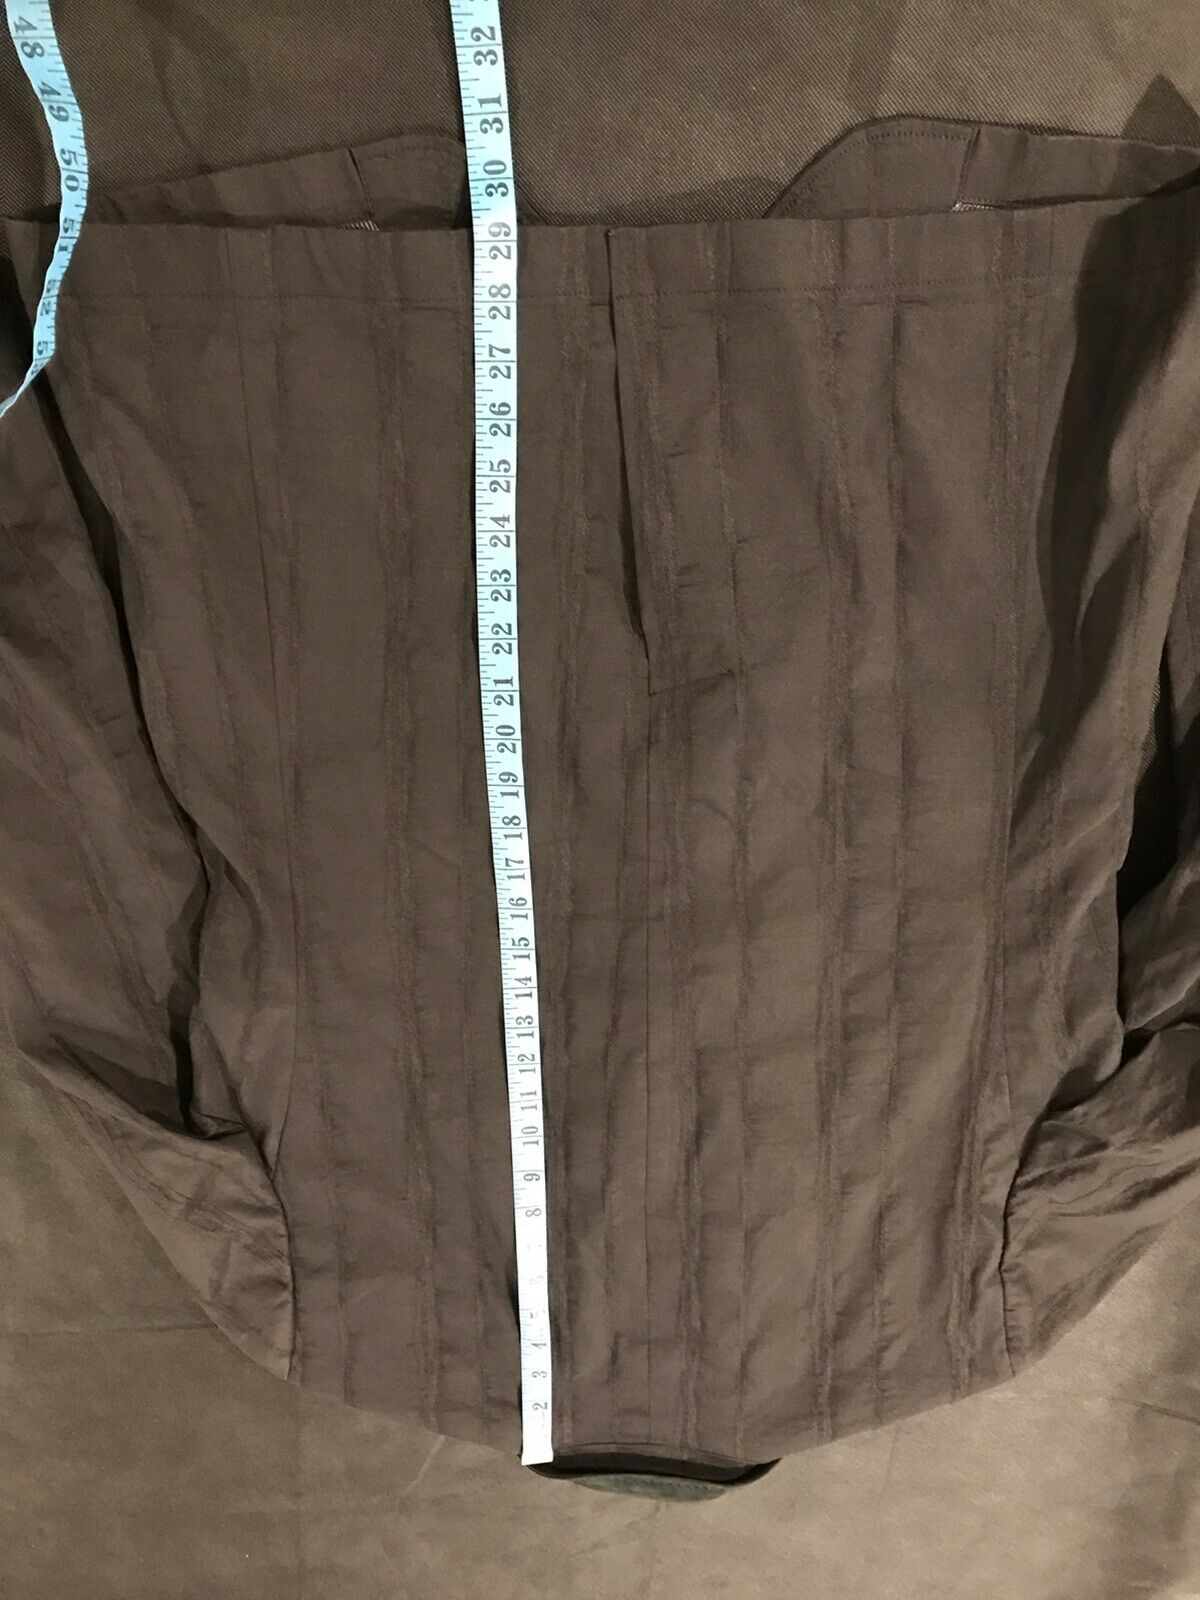 John Varvatos Suit. 50-52 R. $2000 - image 9